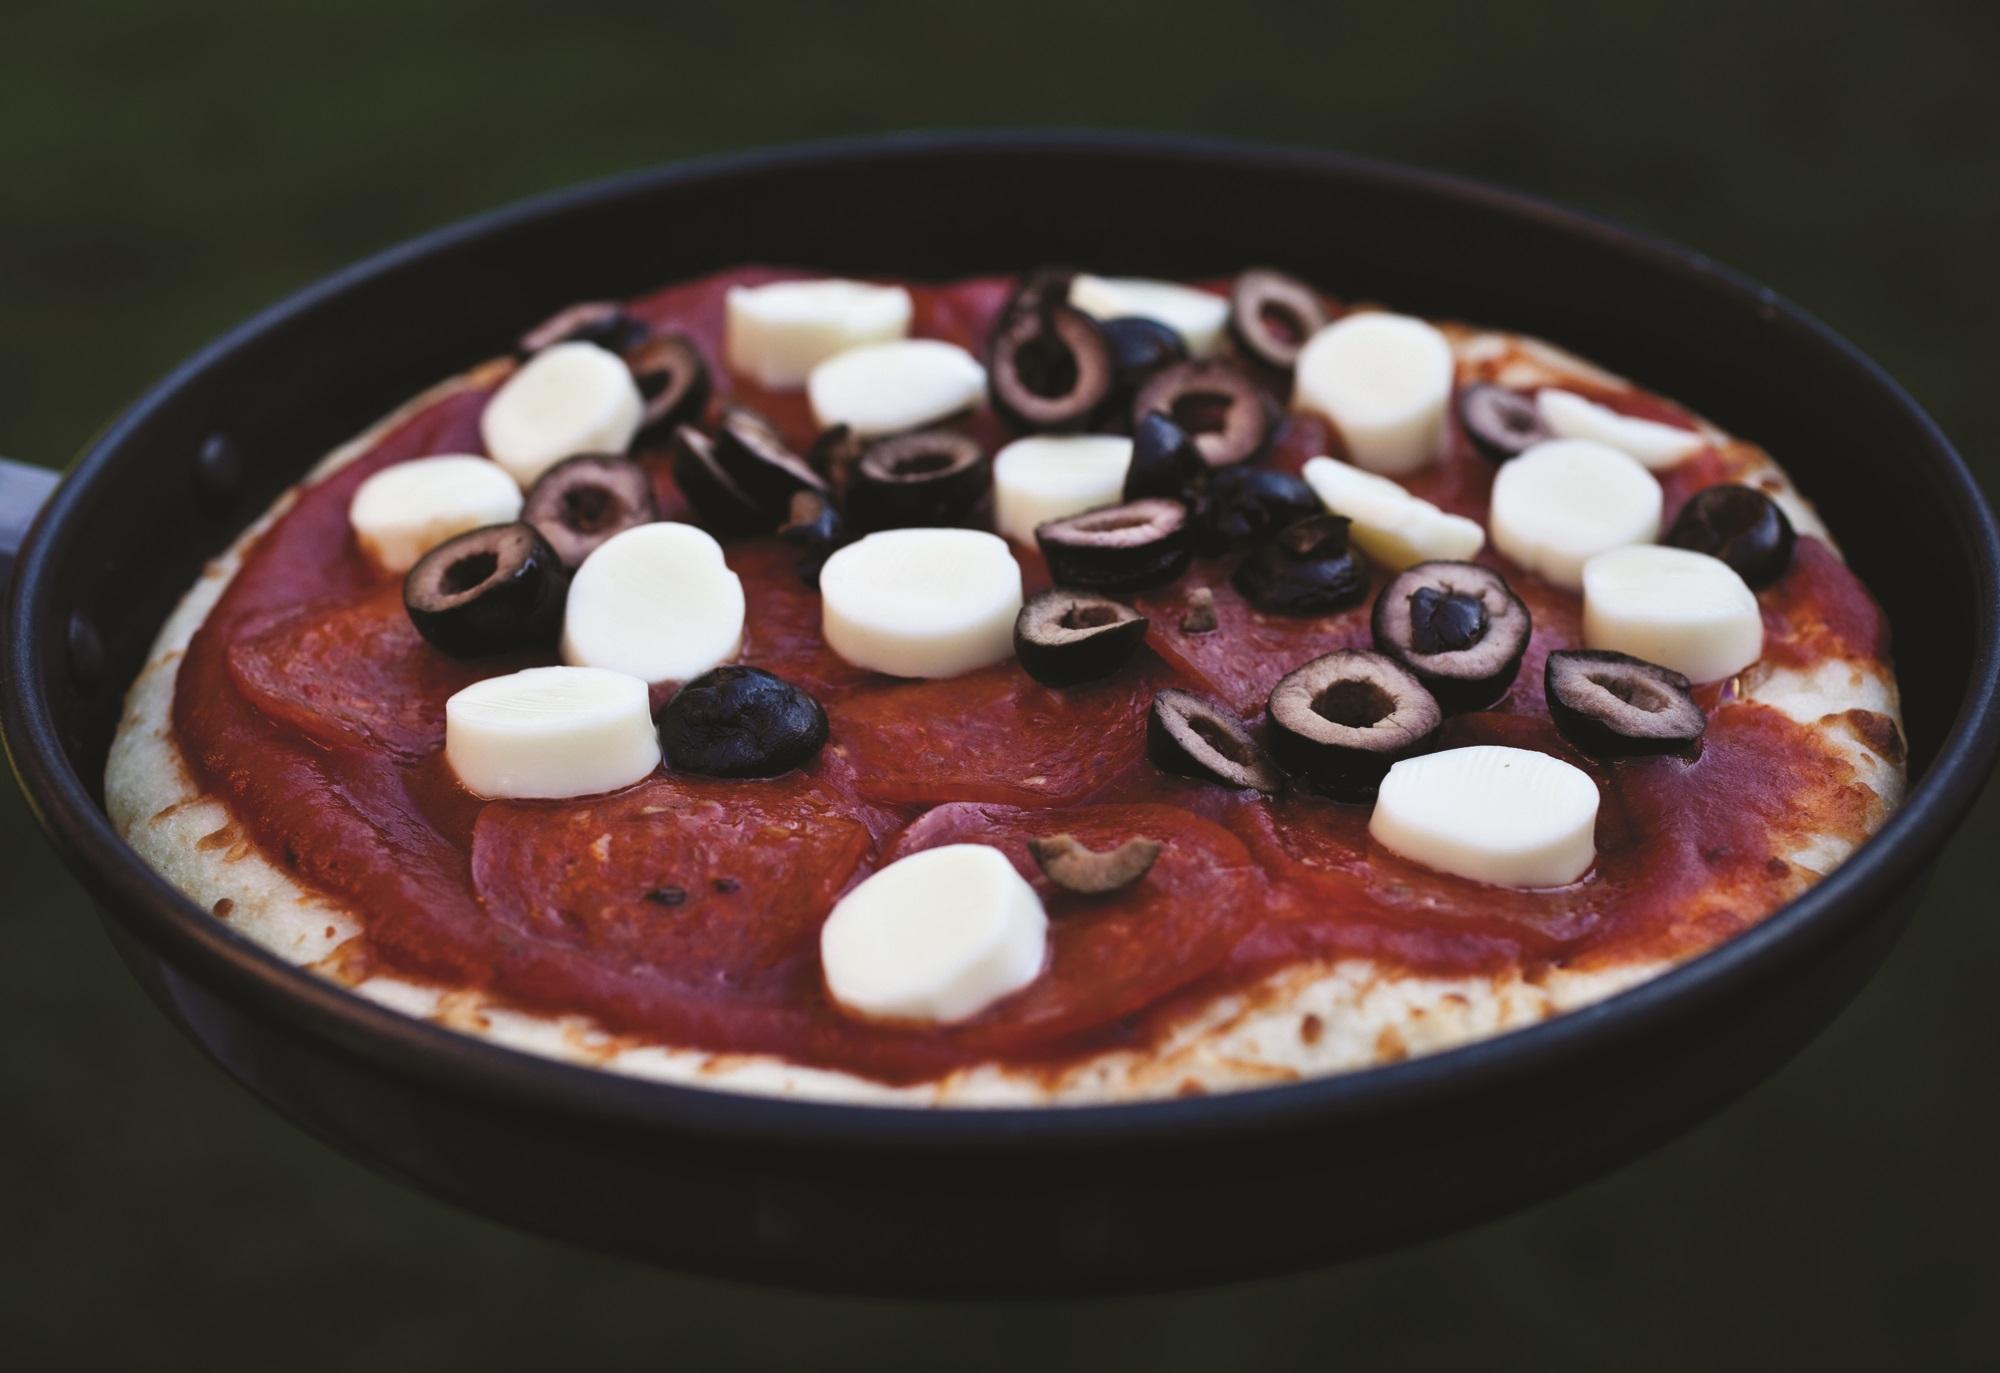 Pizza by Kirk Kirkconnell